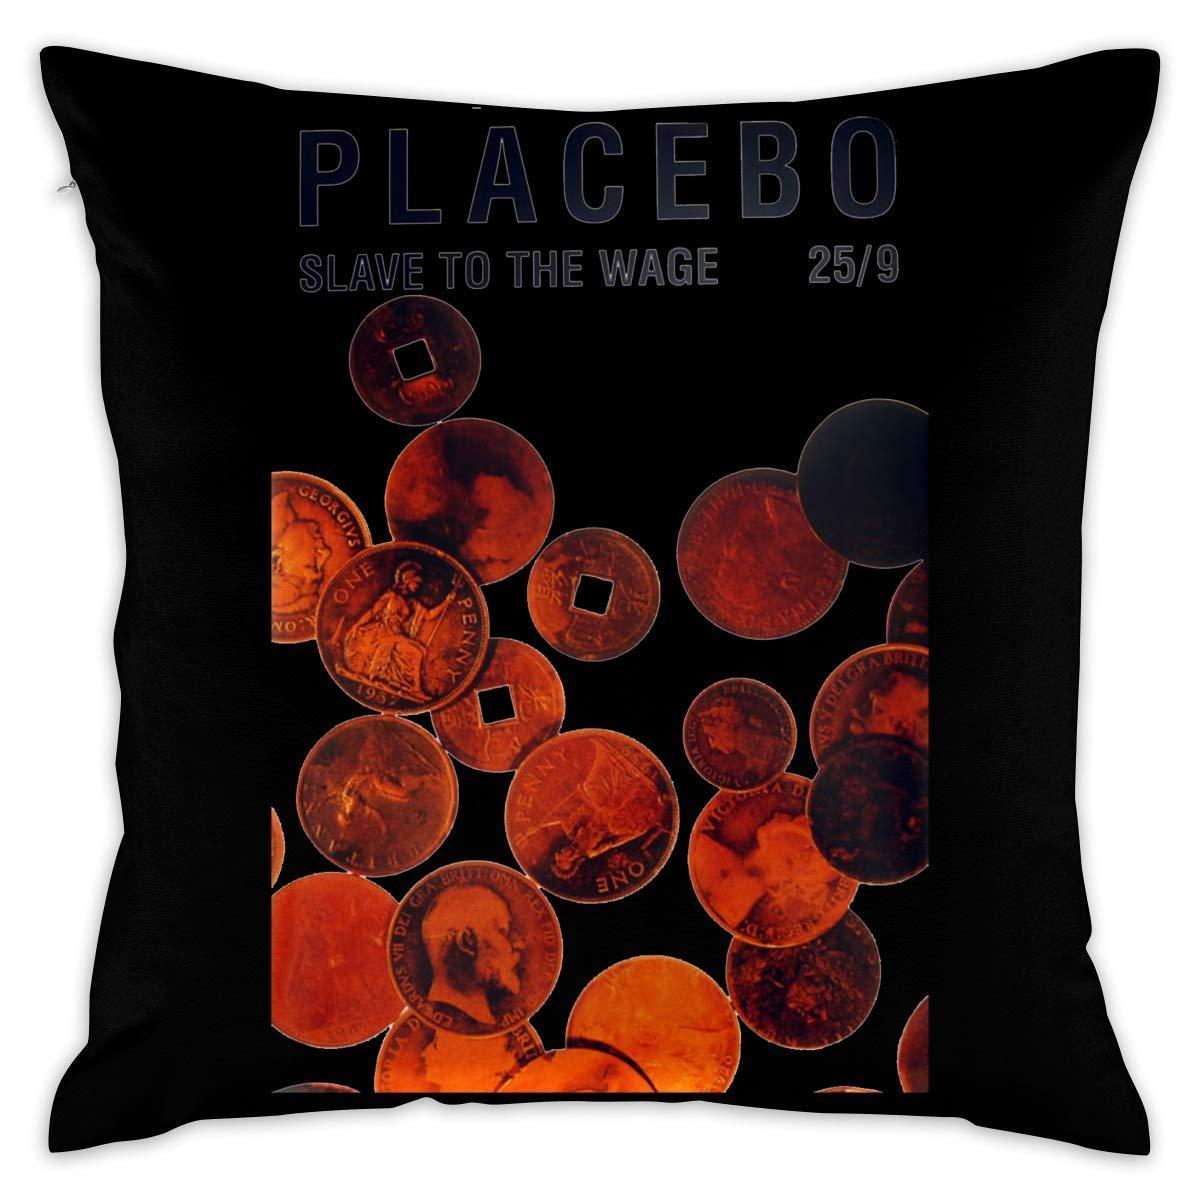 999 PI CA Playstation Joypad Decorative Cushion Cover Pillow Covers Case Pillowcases Fundas para Almohada